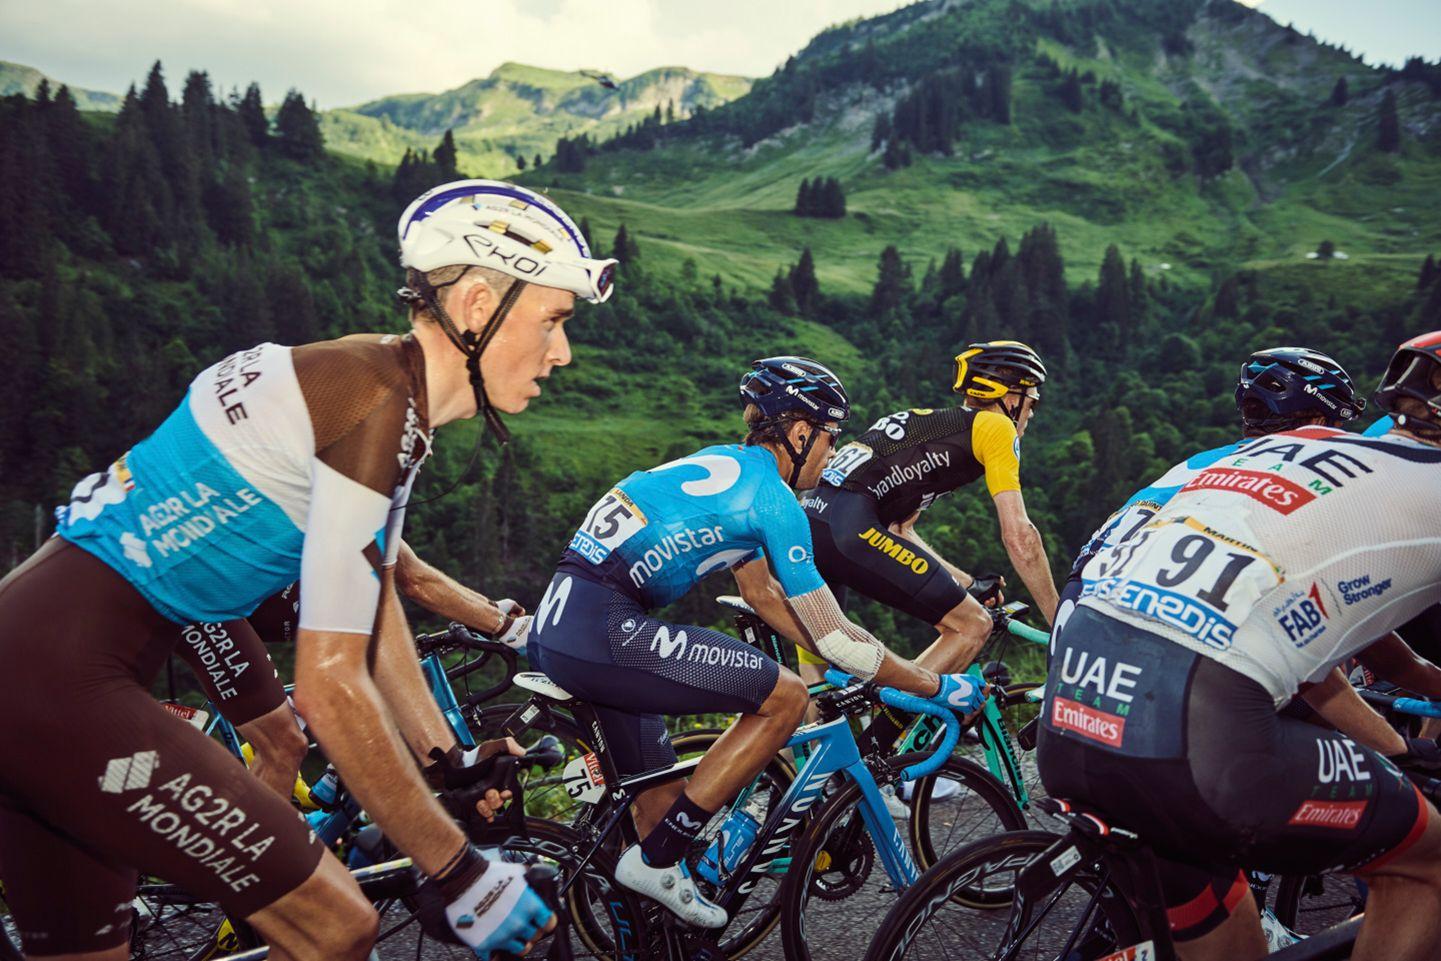 EINMALIGE VERWENDUNG Tino Pohlmann/ arena/ Tour de France